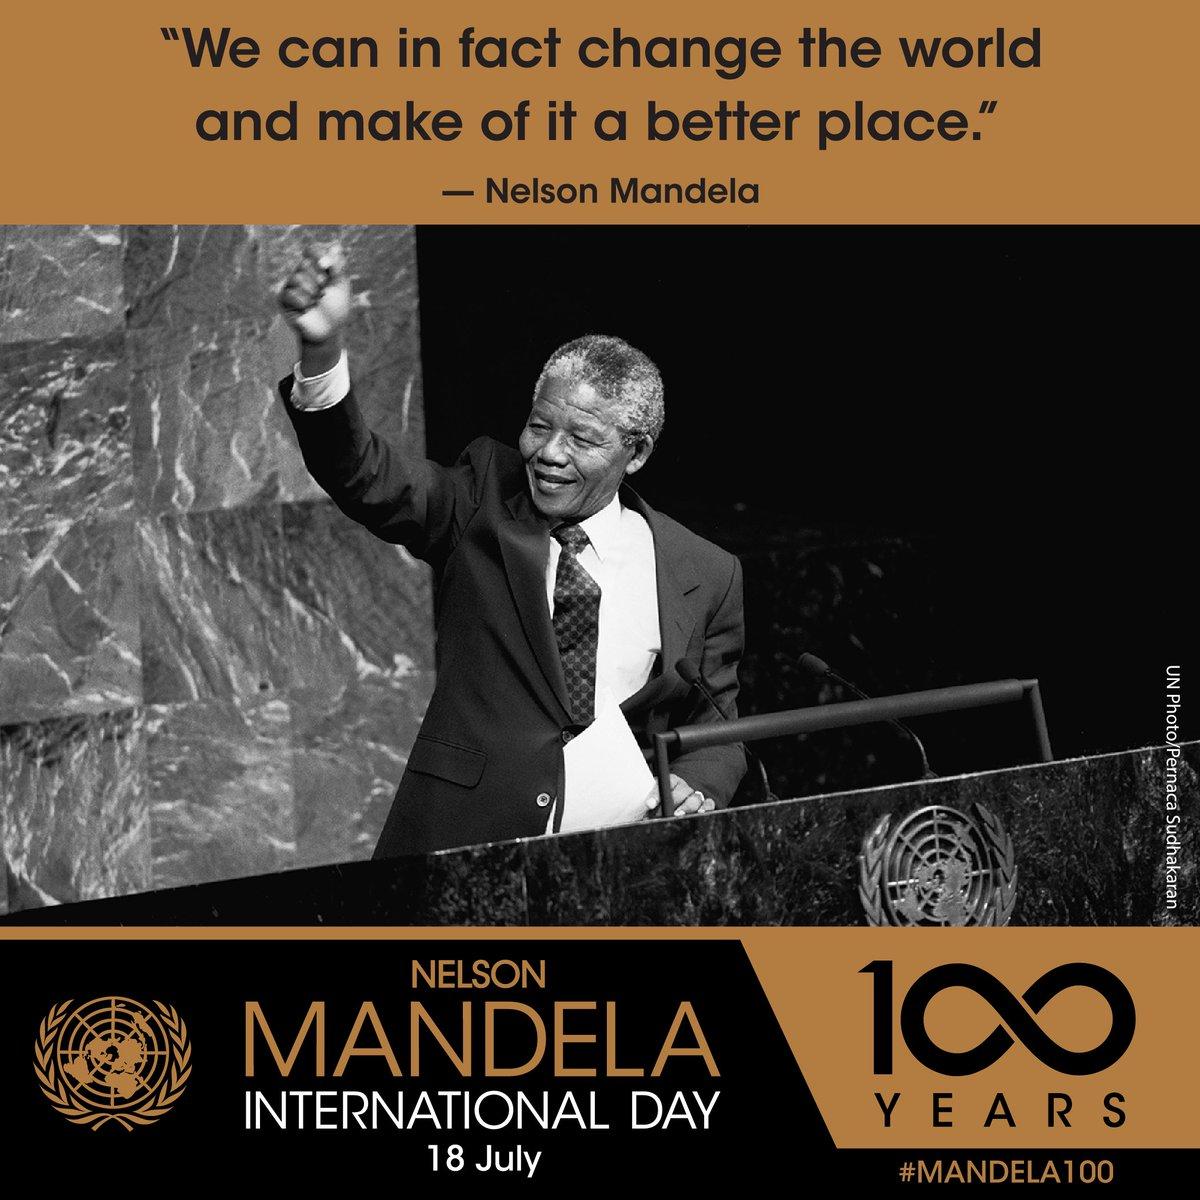 On #MandelaDay, join us & follow @NelsonMandela's footsteps!  Take action for equality & inspire change. #Mandela100